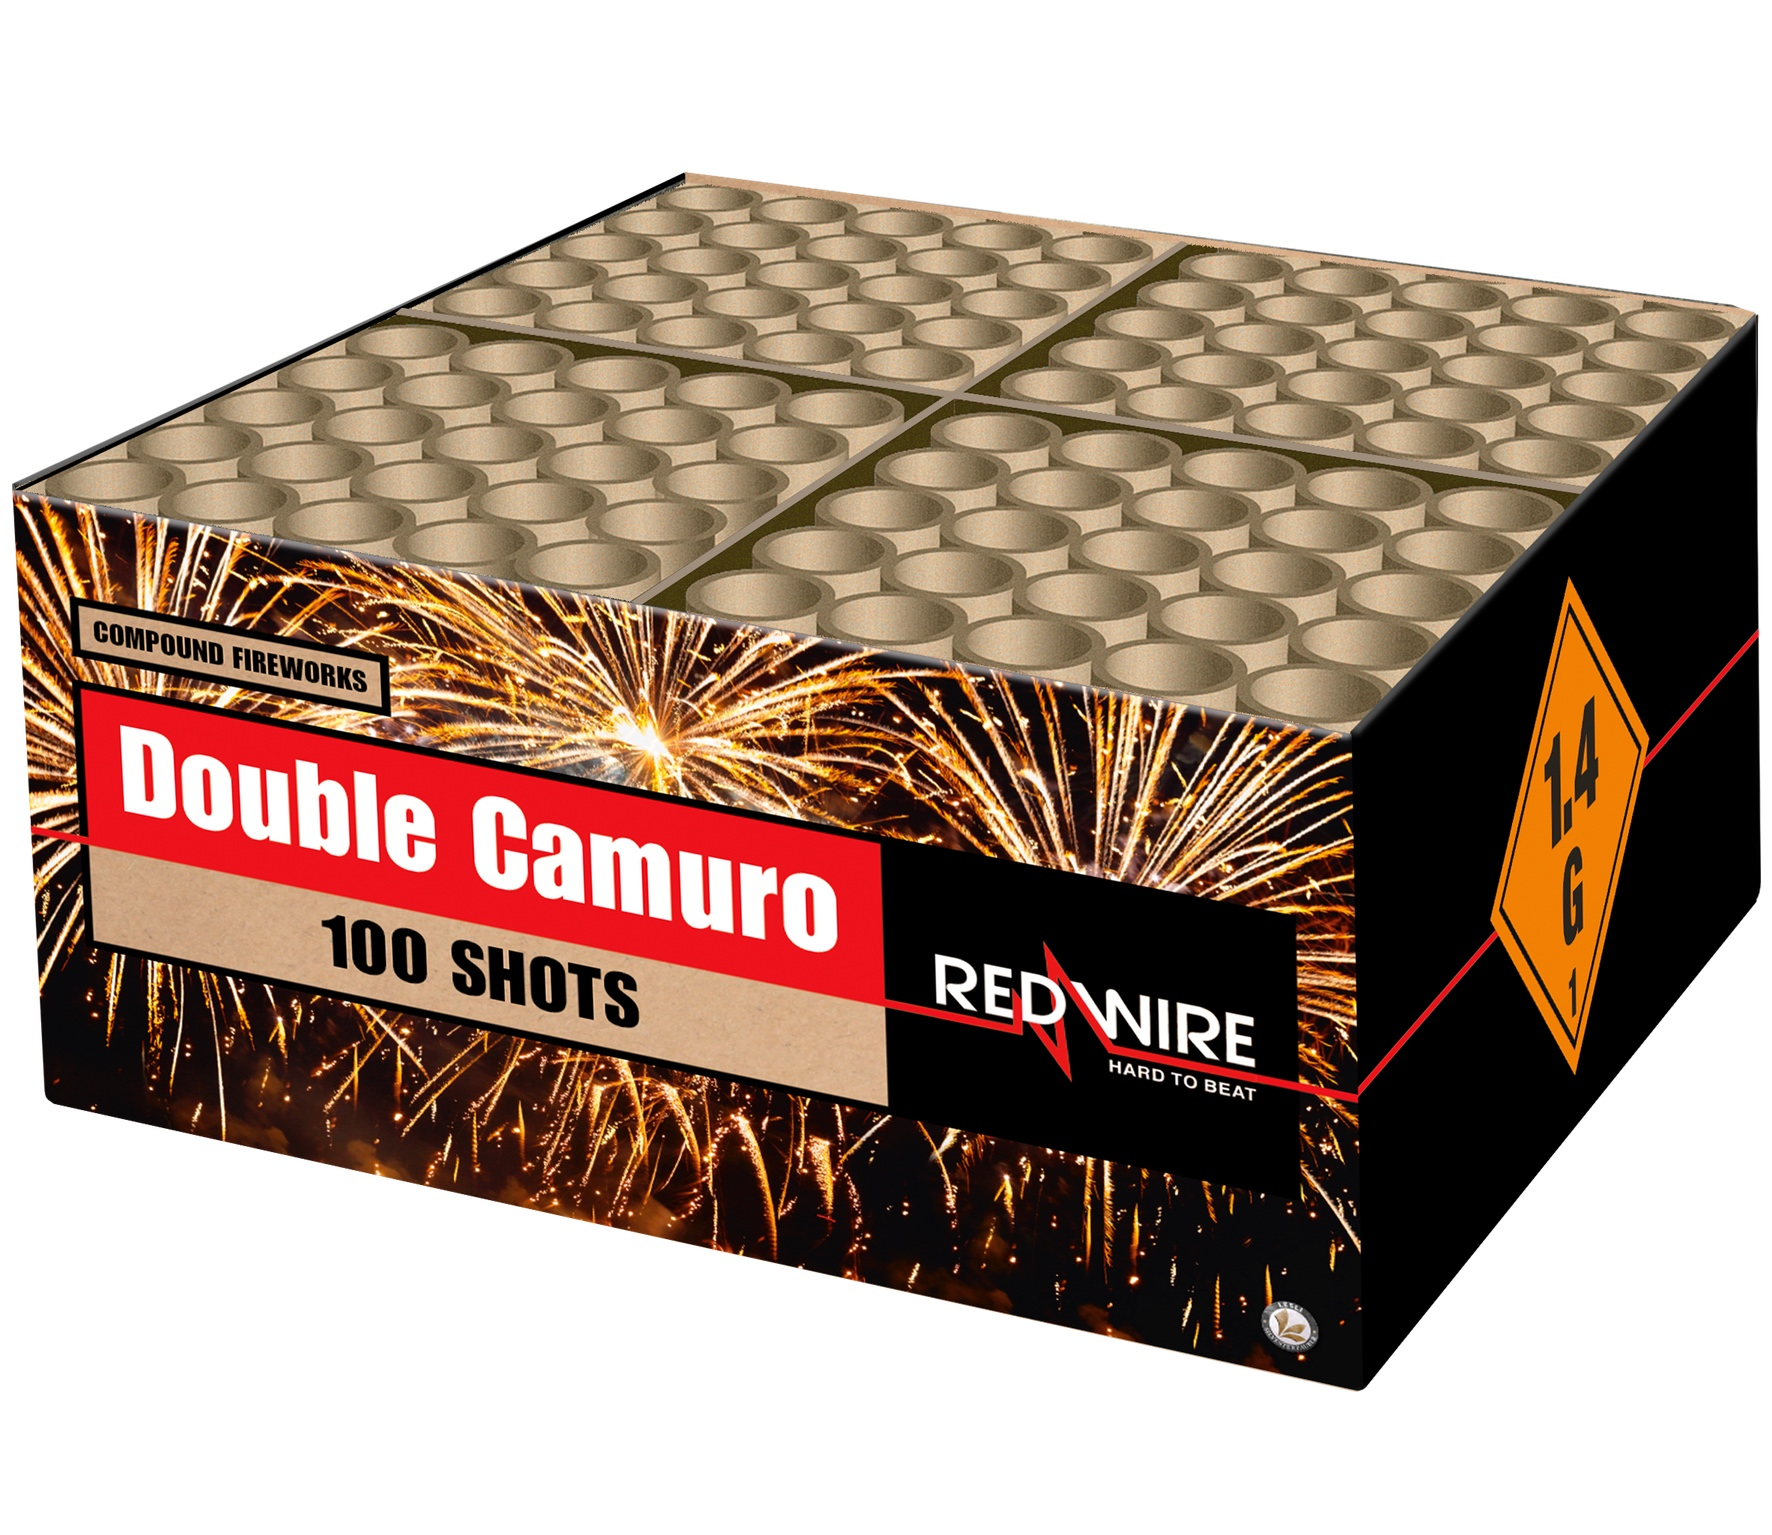 Double Camuro 100 schots